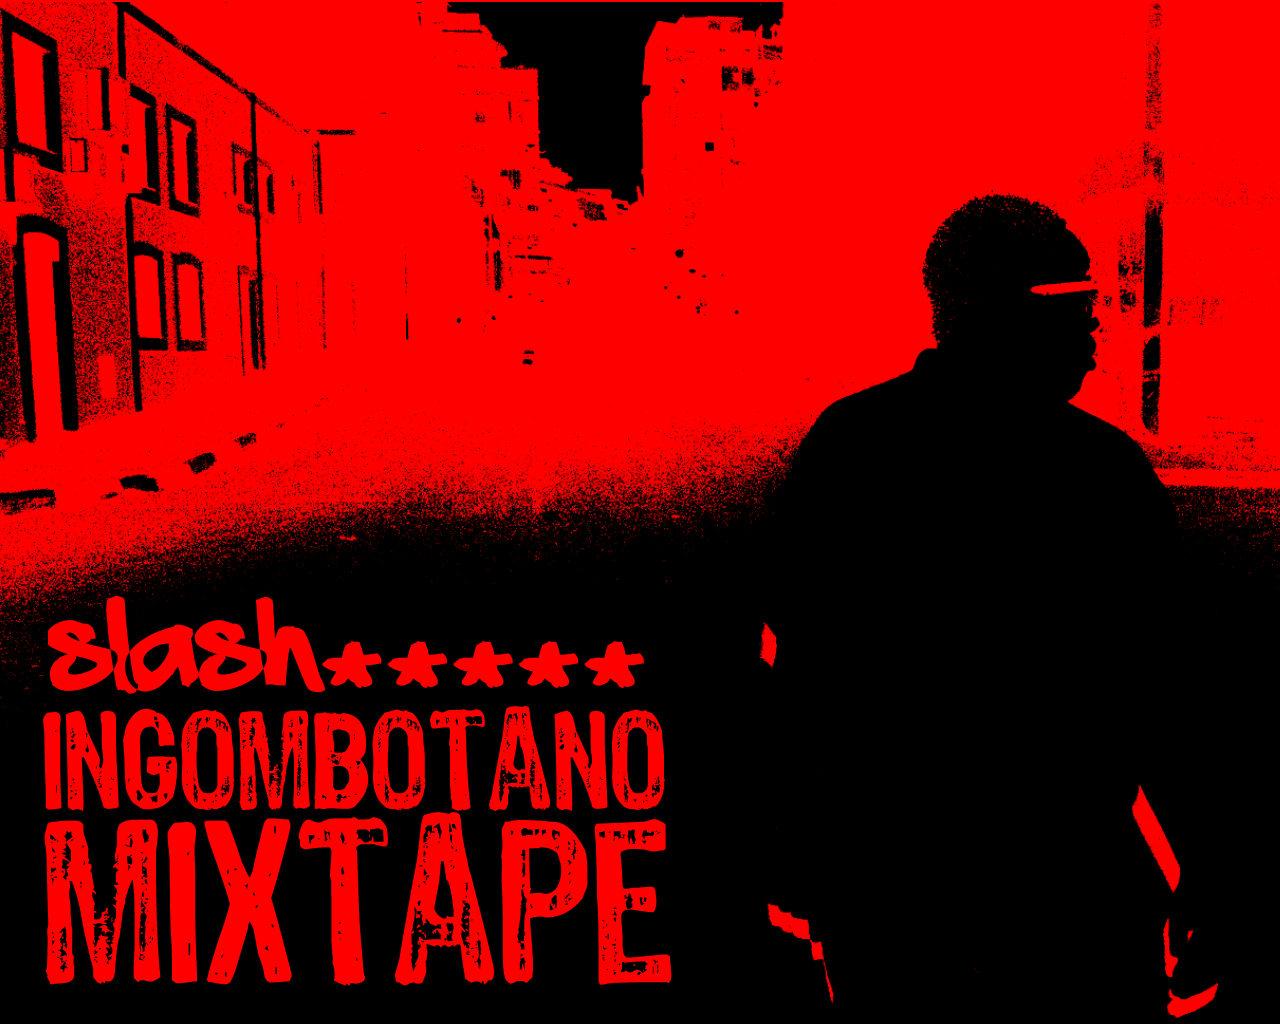 http://2.bp.blogspot.com/_IazlRIn22Hw/TI_Fe_vtmxI/AAAAAAAAAOc/a2BlbIUKLKY/s1600/Slash+-+Mixtape+Ingombotano.jpg